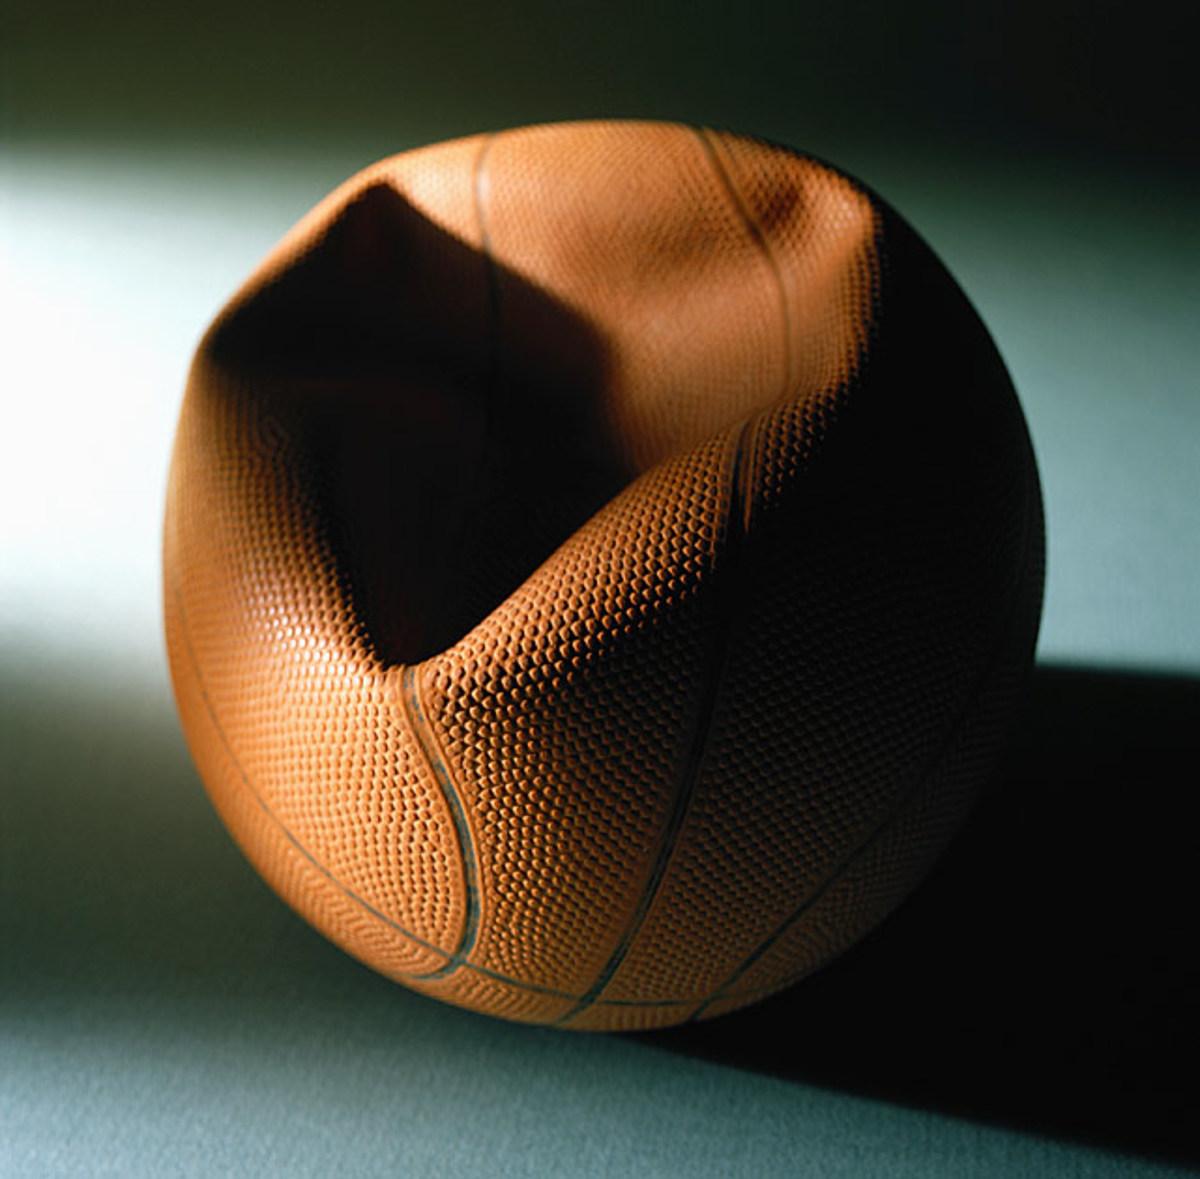 131011163213-031113-deflated-basketball-single-image-cut.jpg